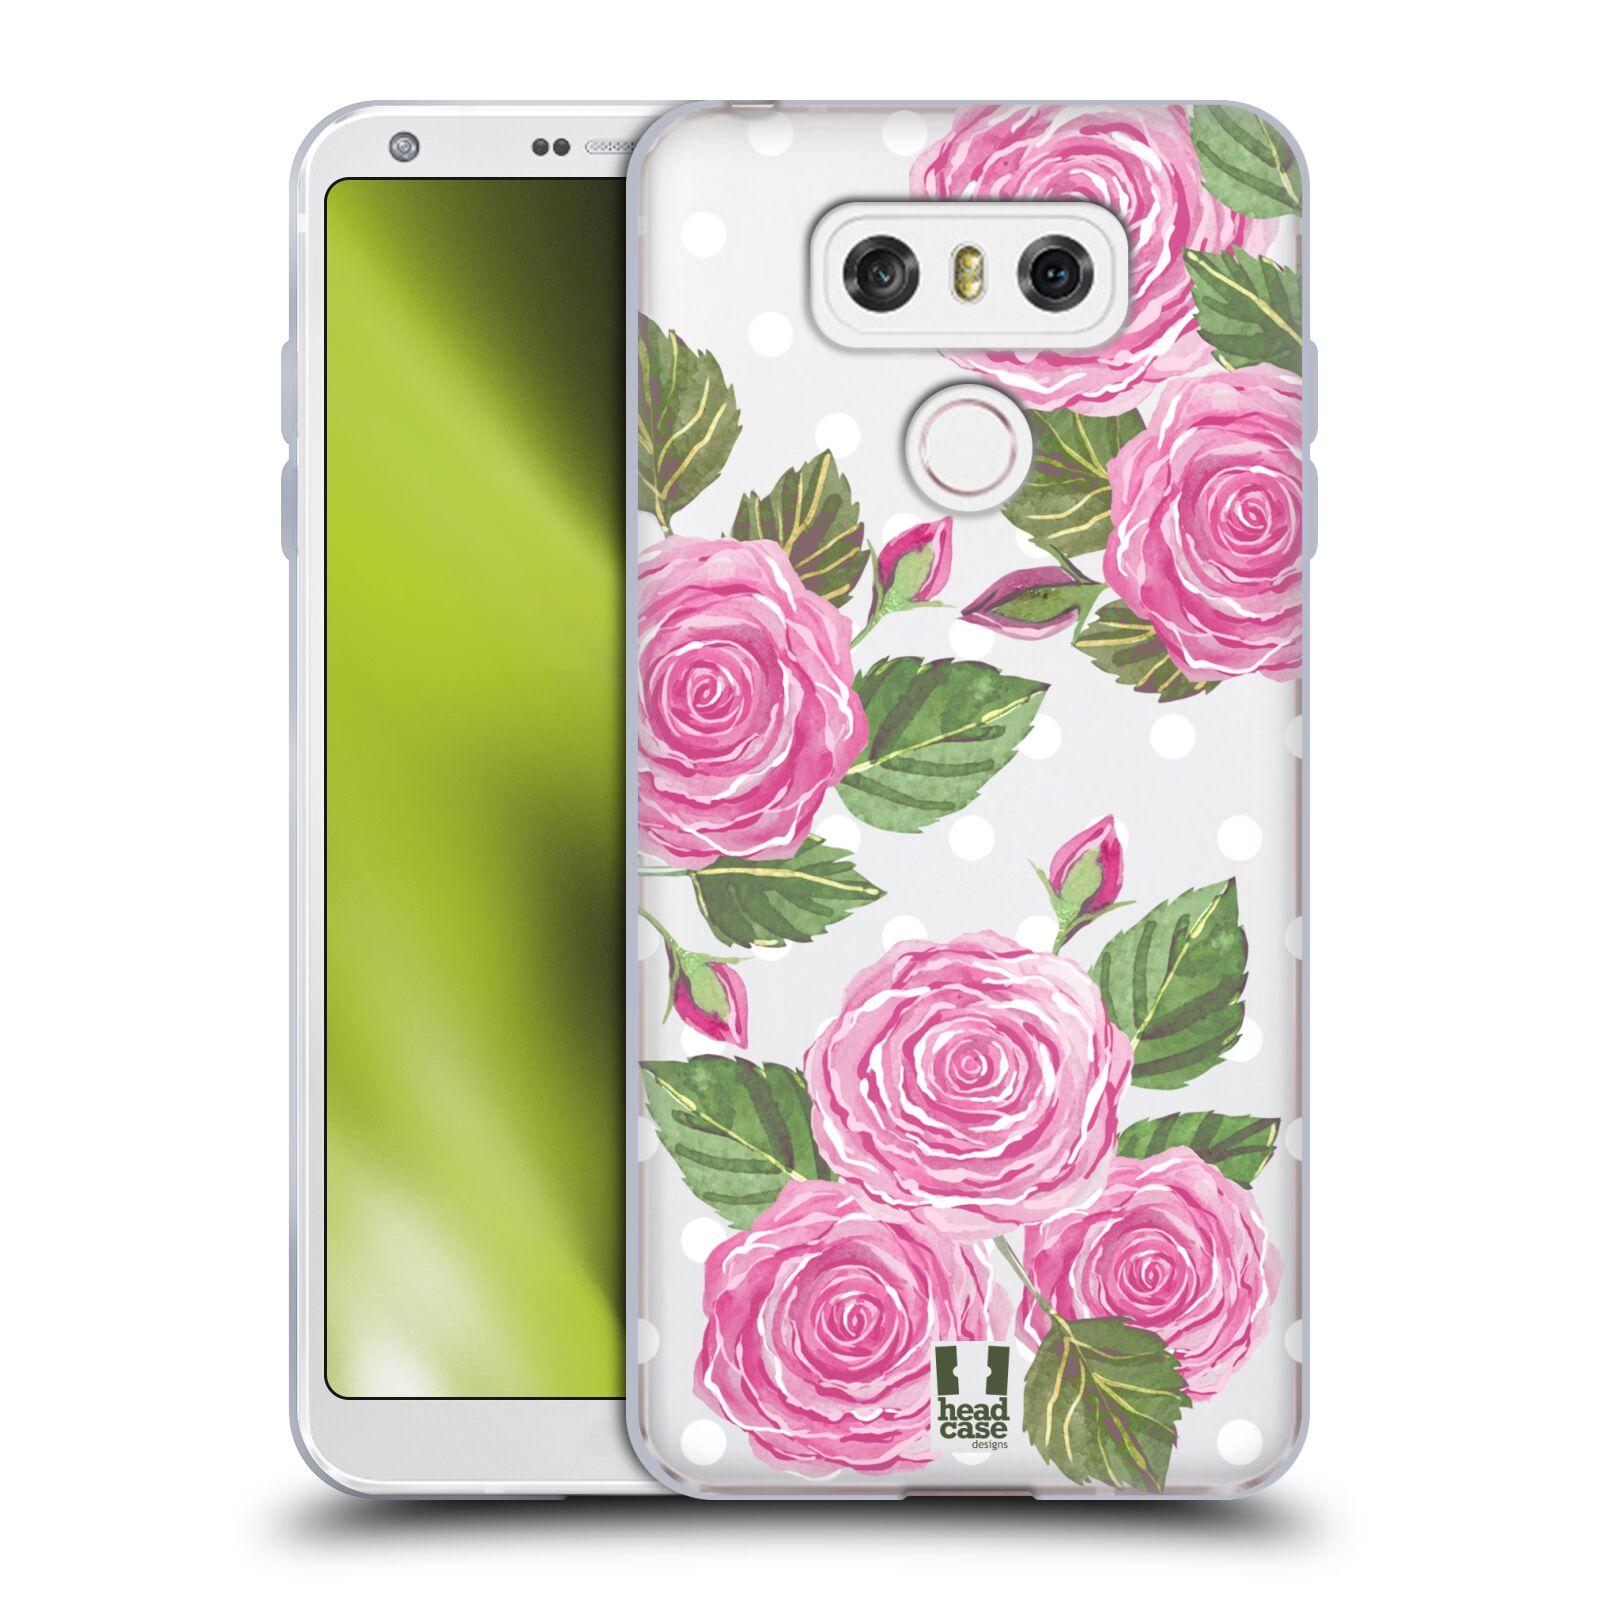 Silikonové pouzdro na mobil LG G6 - Head Case - Hezoučké růžičky - průhledné